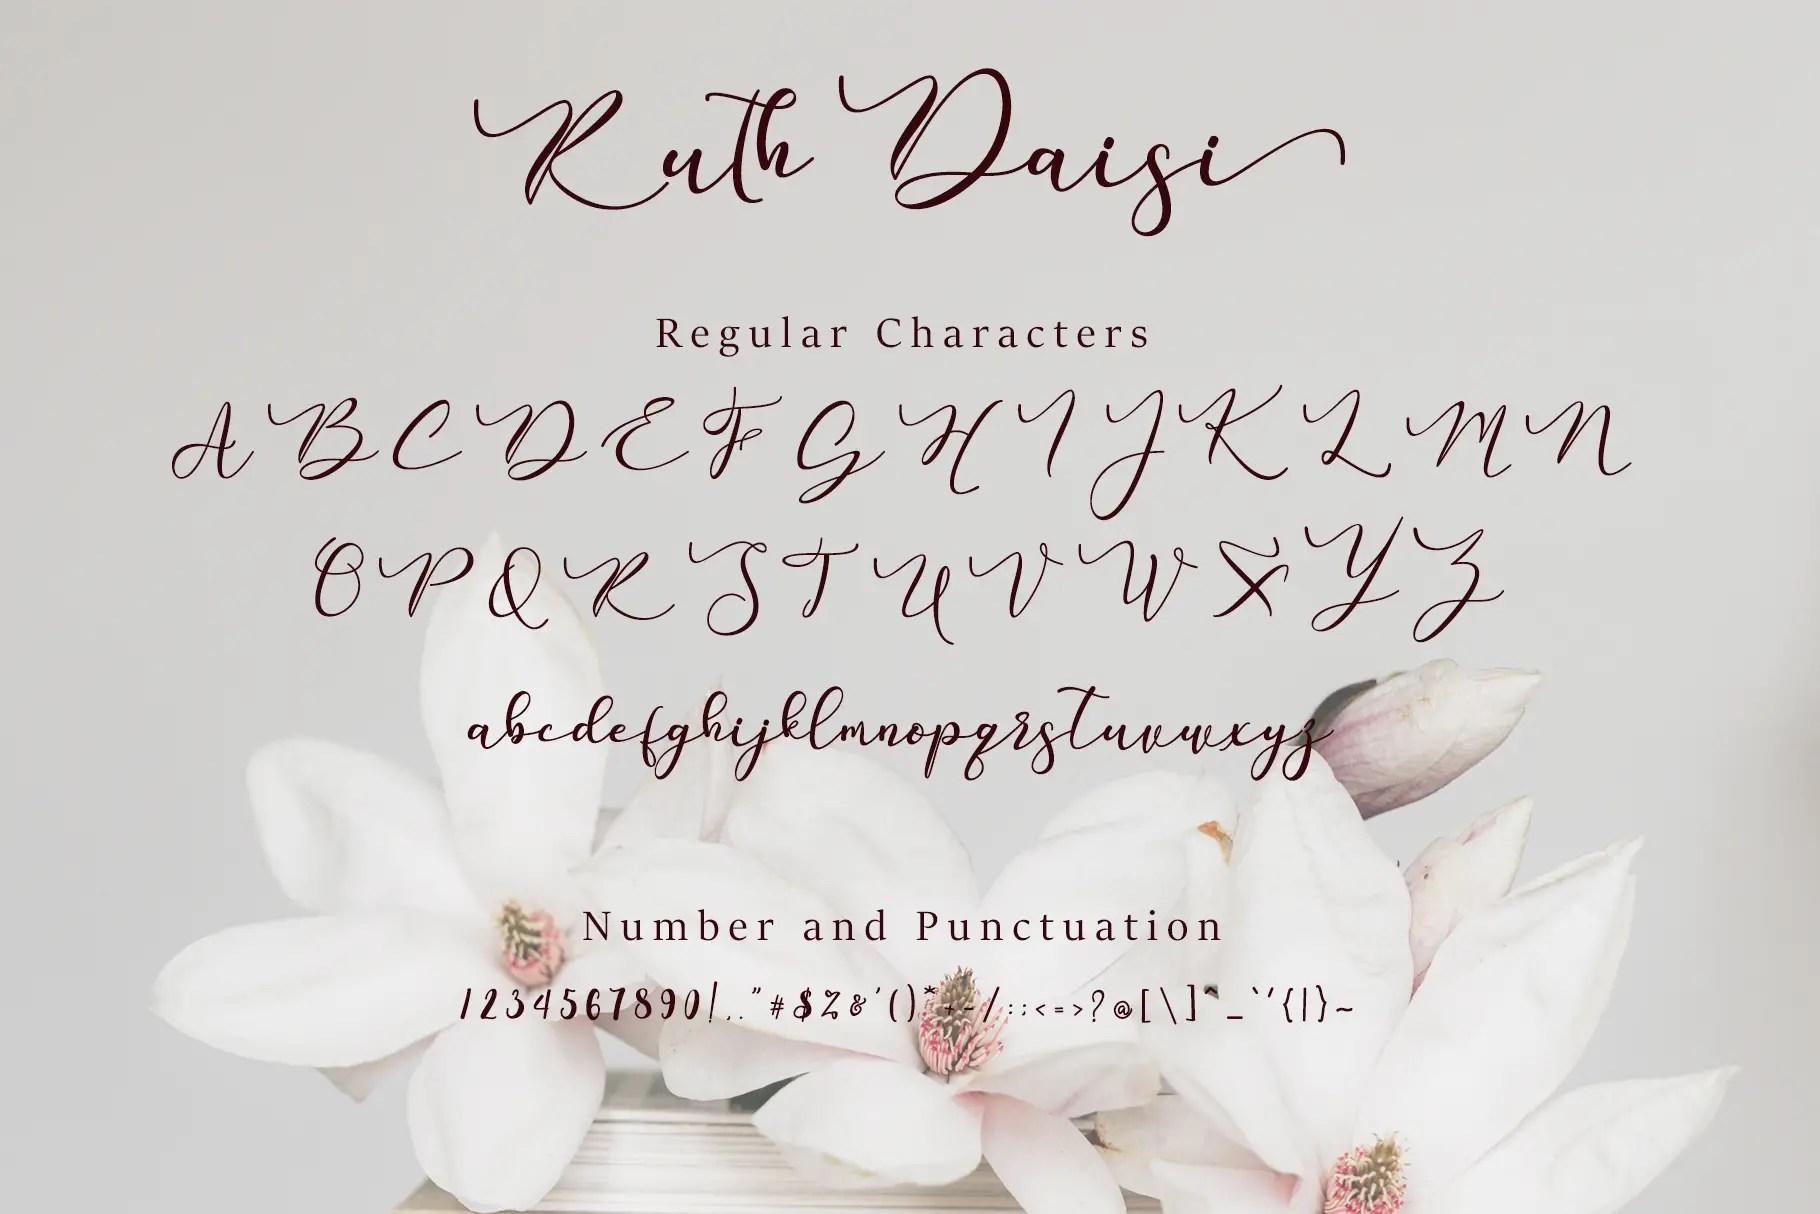 Ruth Daisi Calligraphy Font -3